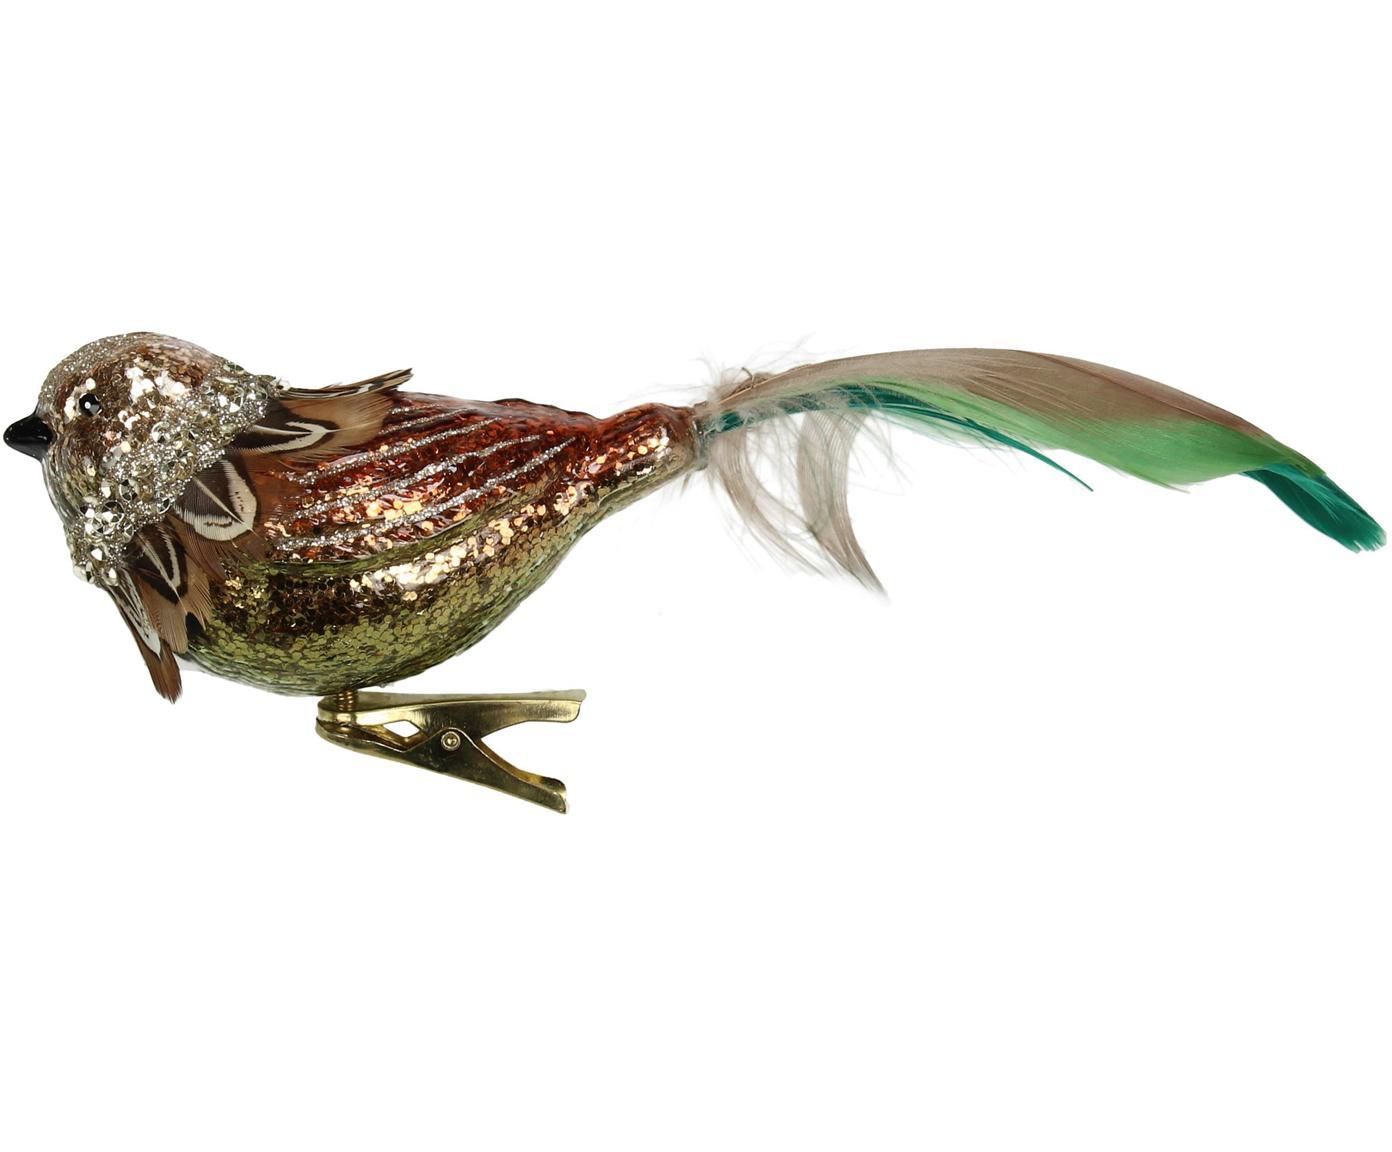 Kerstboomhanger Bird, Multicolour, 19 x 8 cm